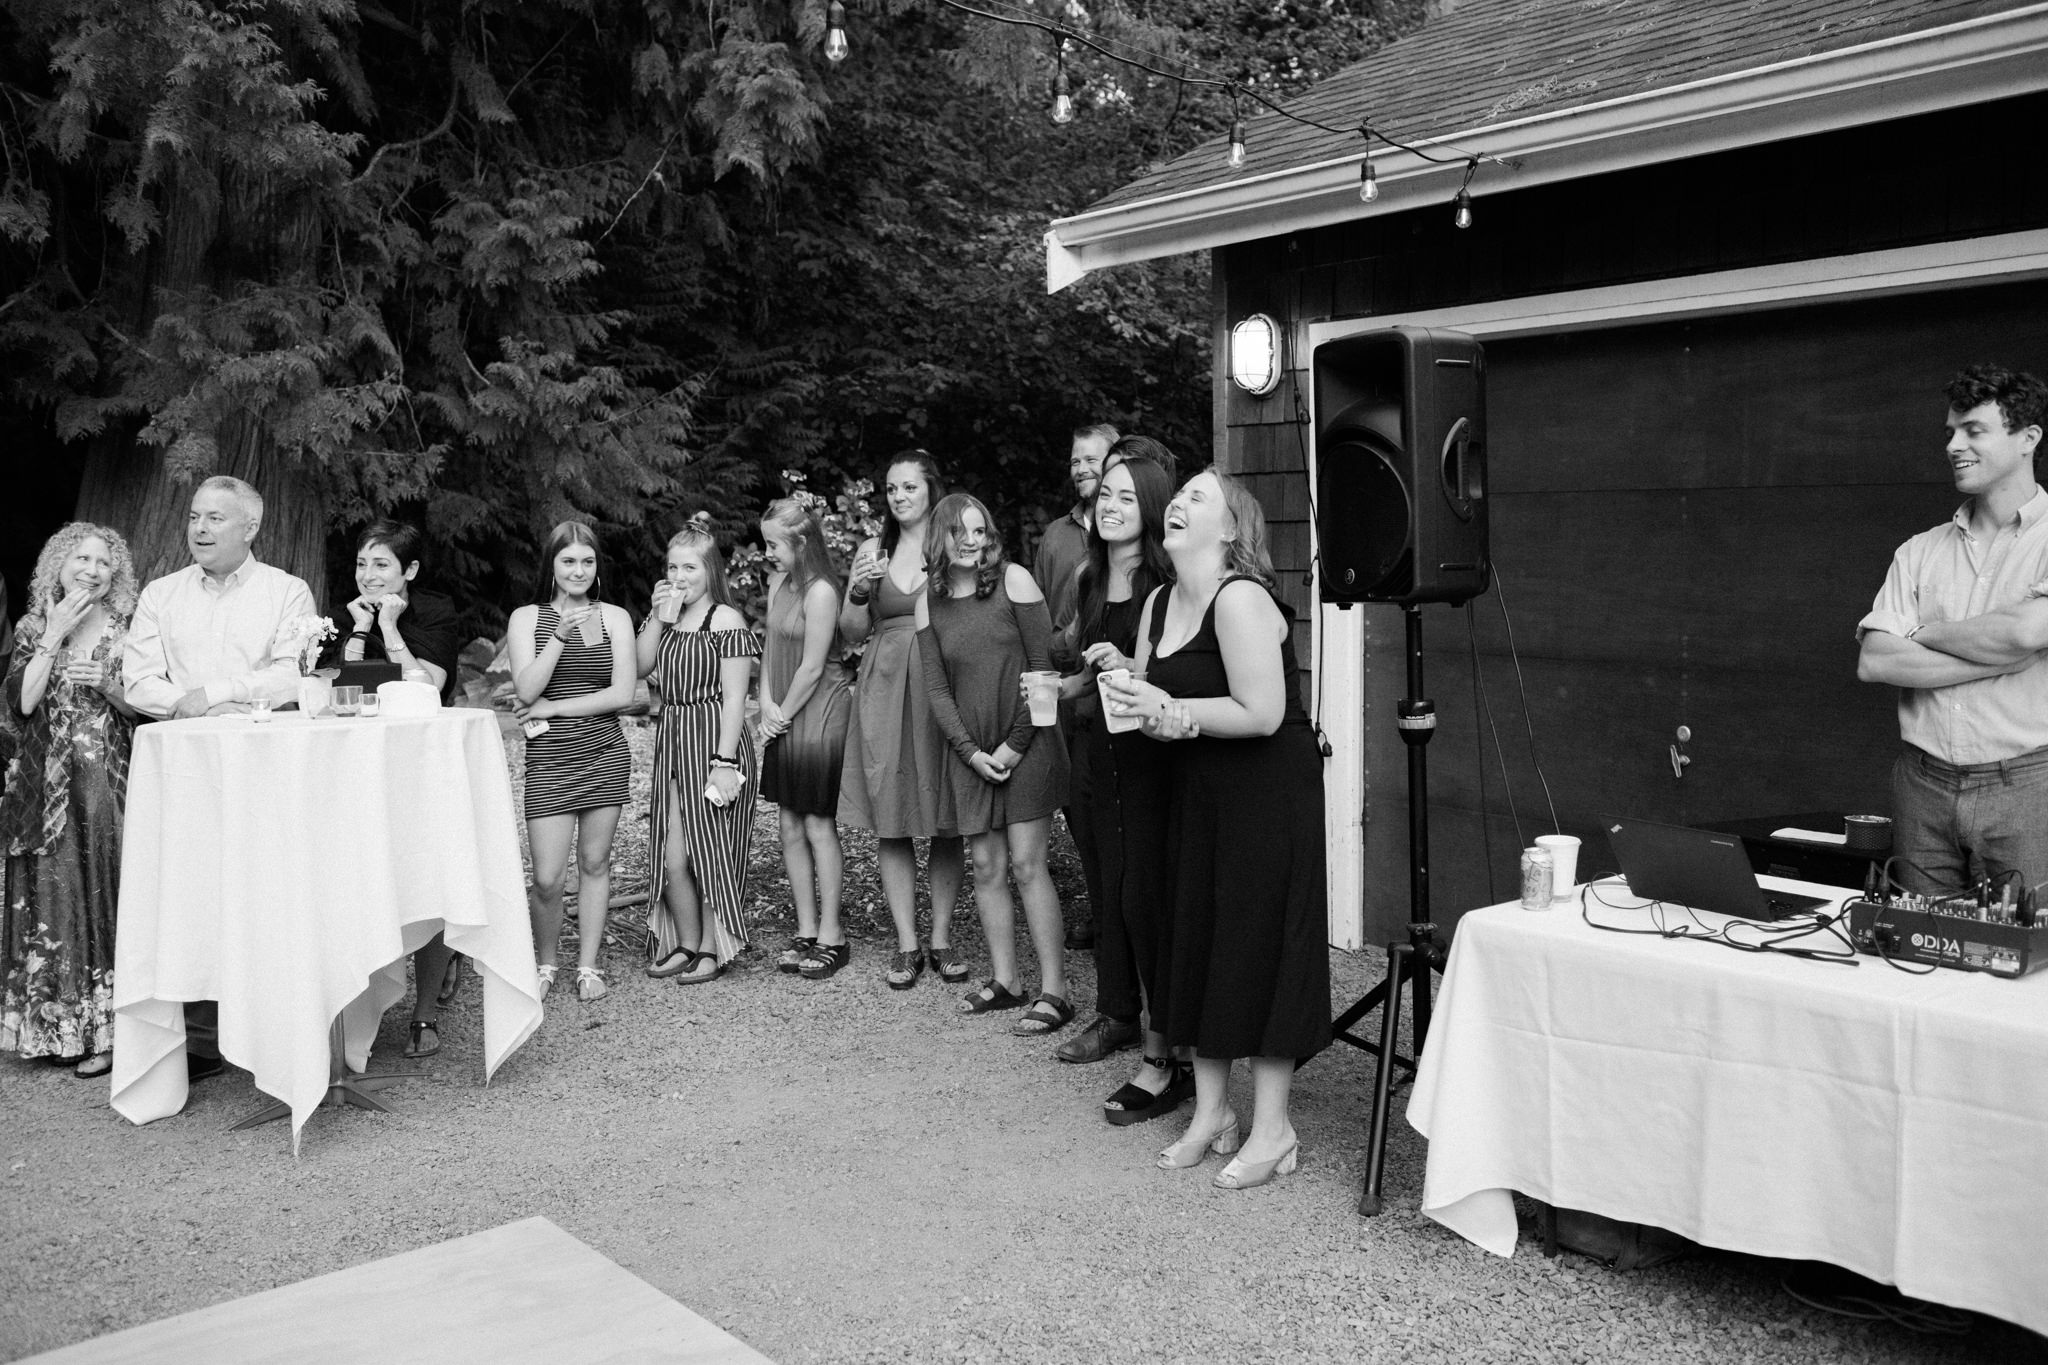 Backyard-Bainbridge-Island-Wedding-Alycia-Lovell-Photography-206.JPG